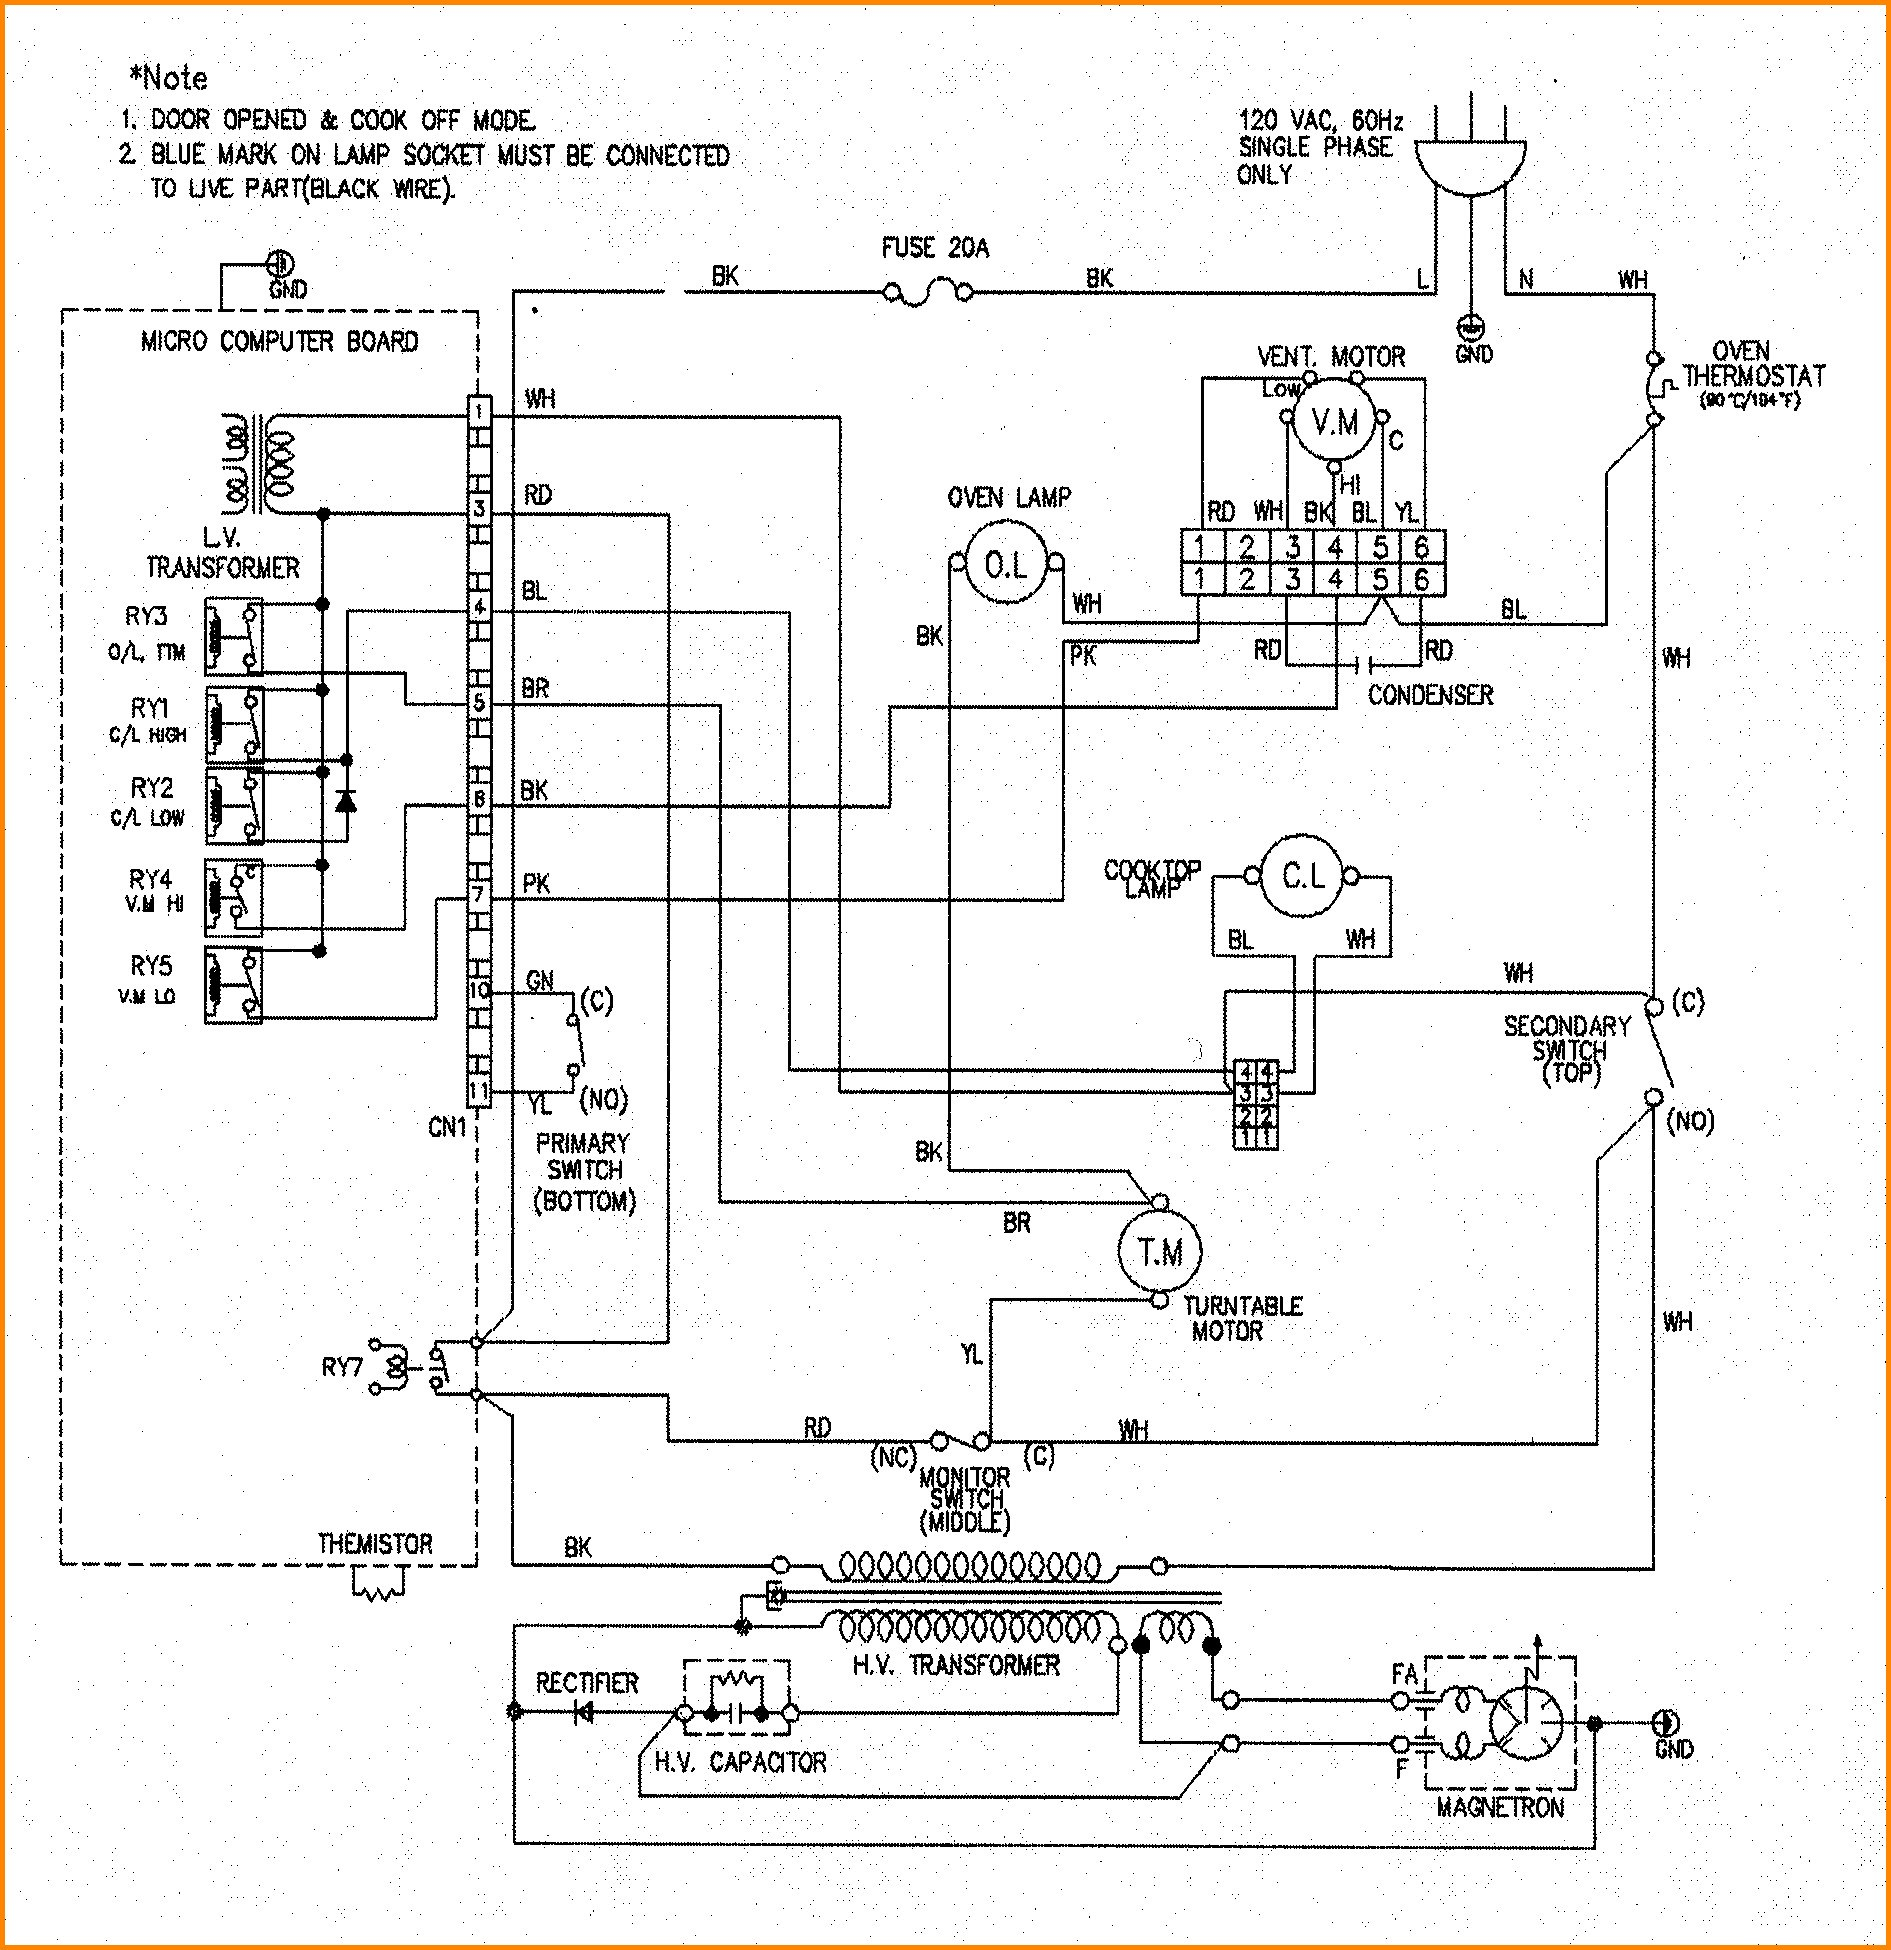 Ge Dryer Electrical Diagram | Wiring Diagram on